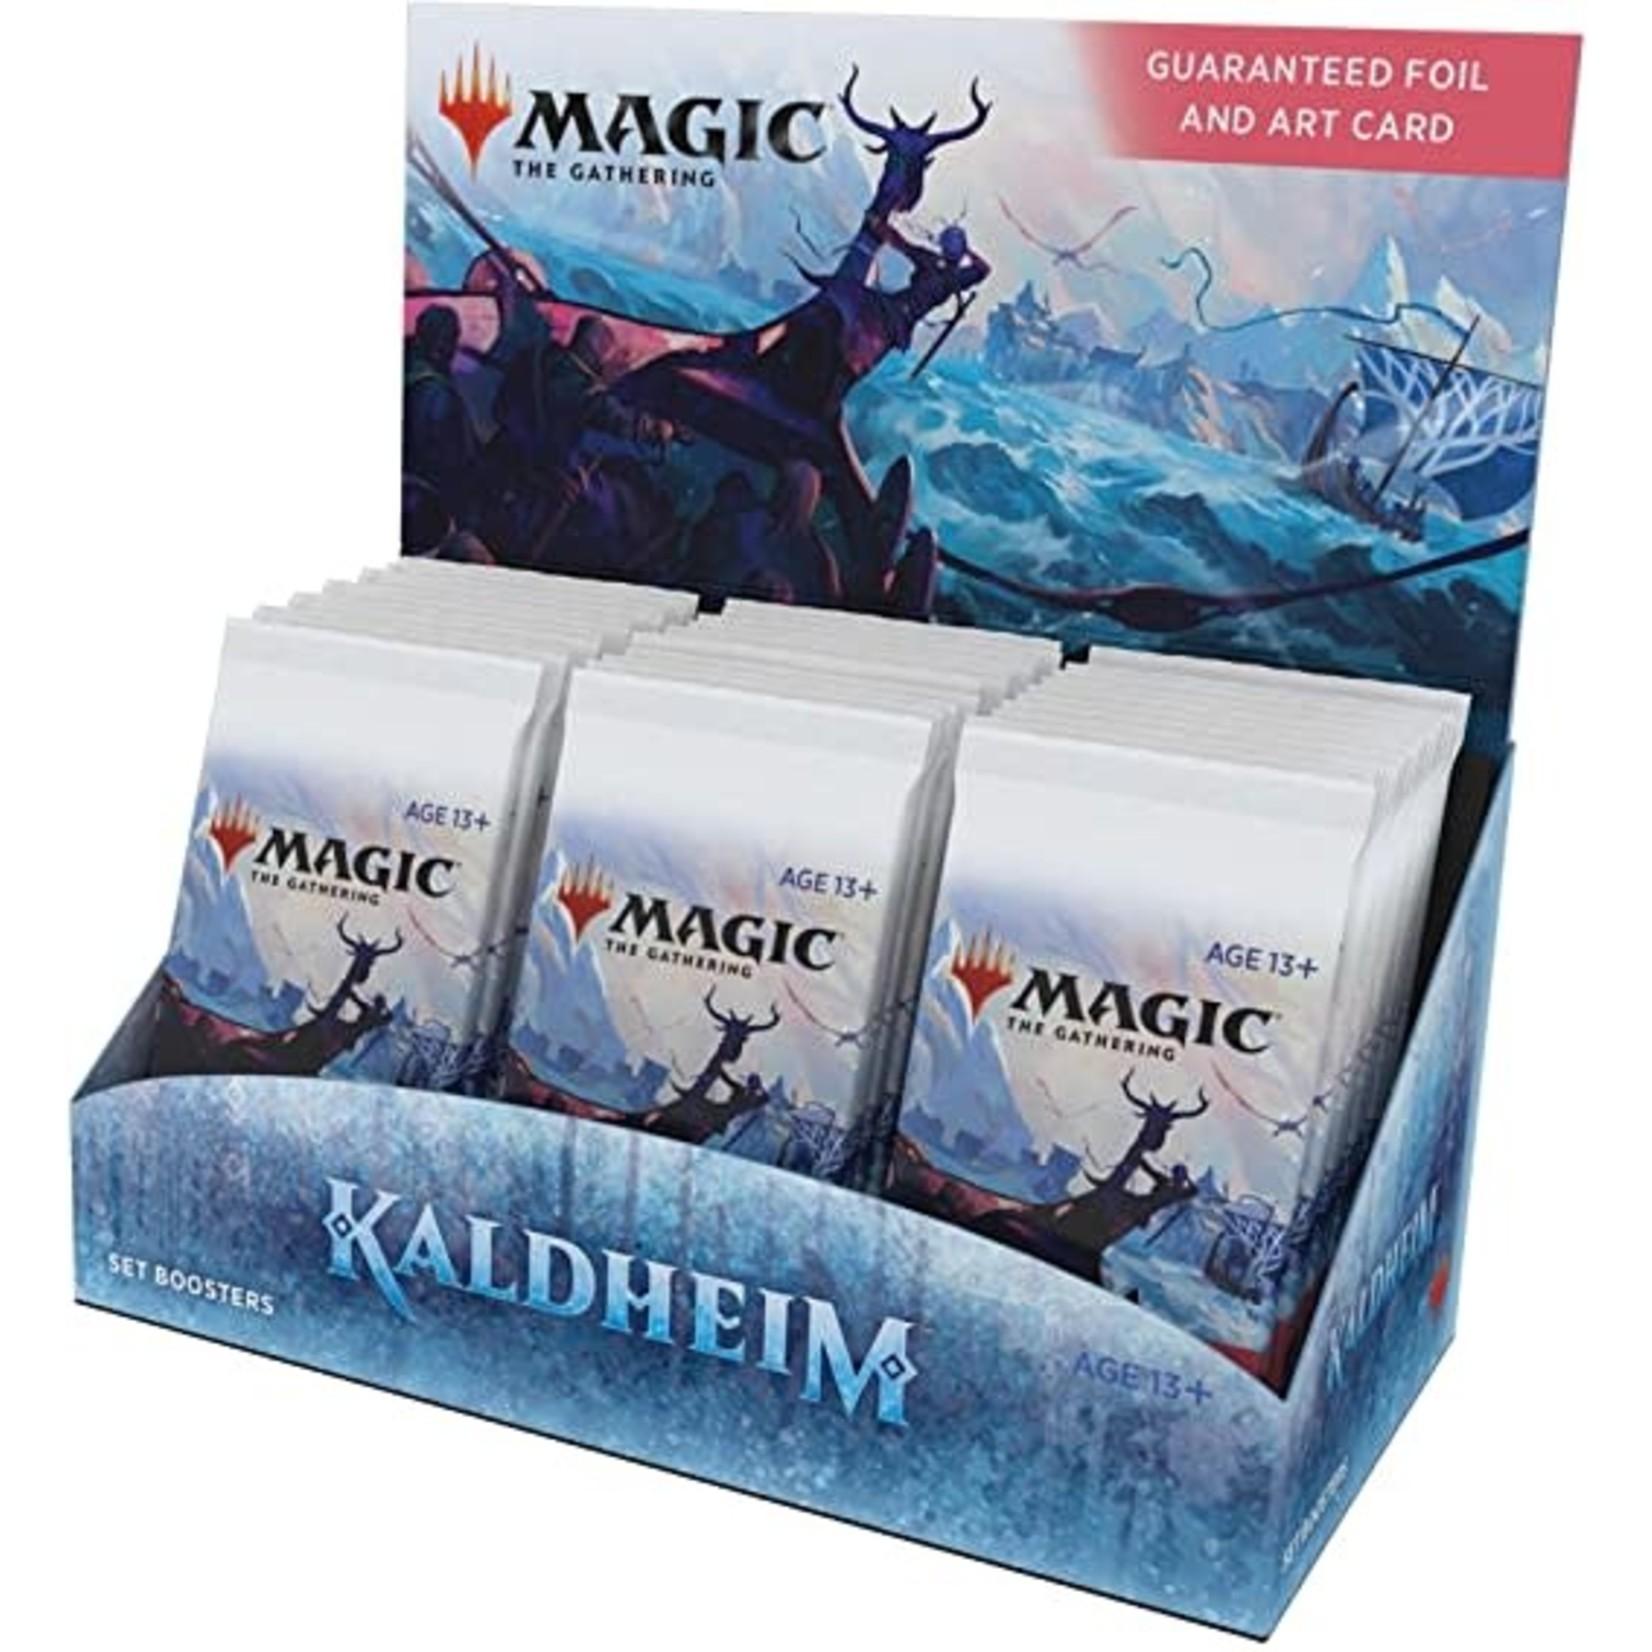 Wizards of the Coast Kaldheim SET Booster Display